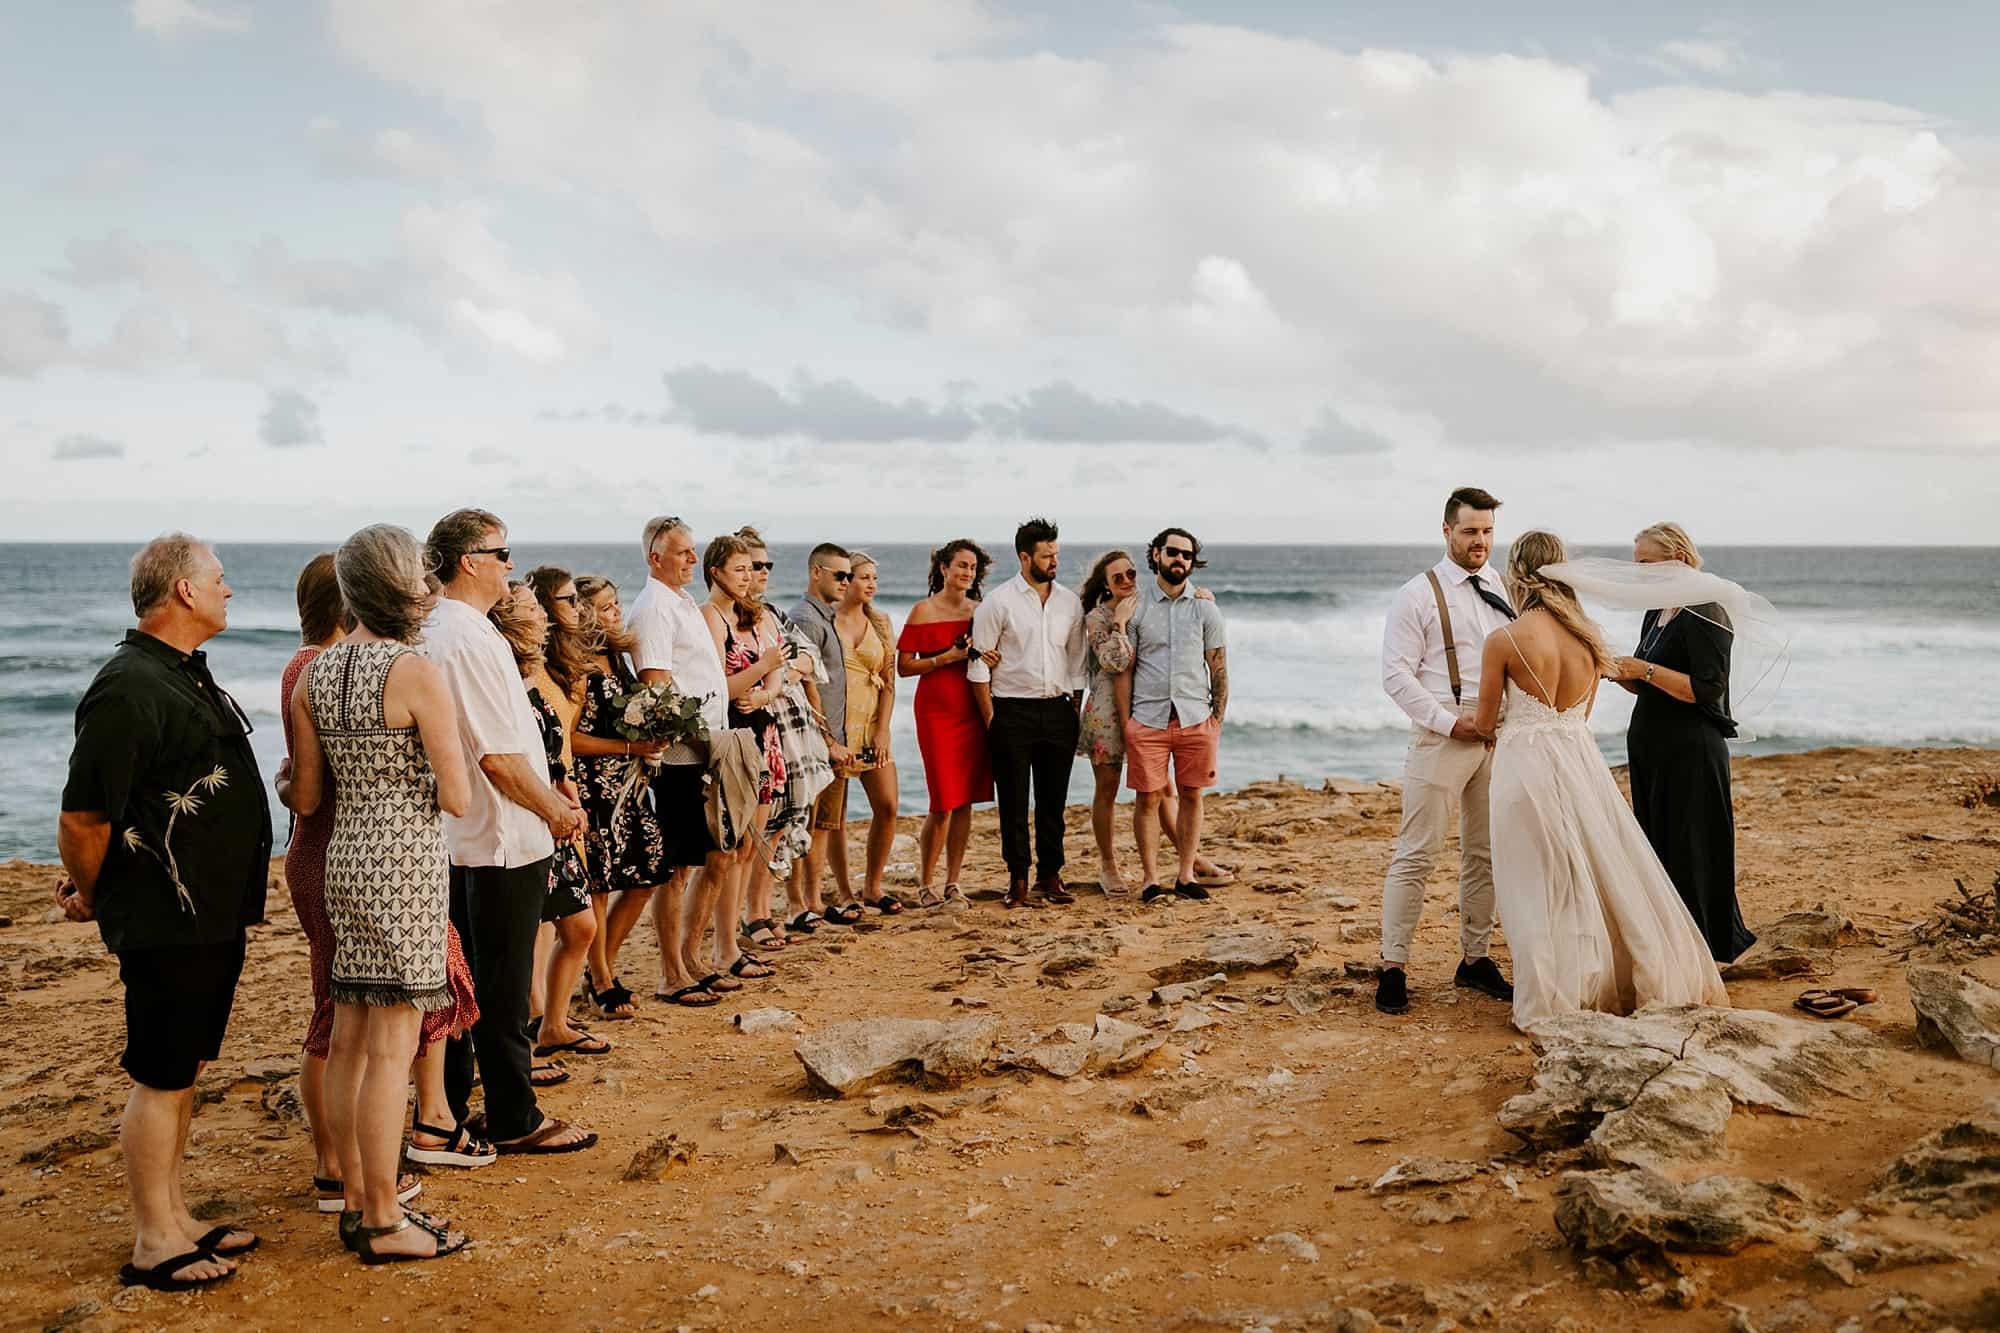 Kauai Hawaii Romantic Ceremony Intimate Wedding Shipwreck Cliffs